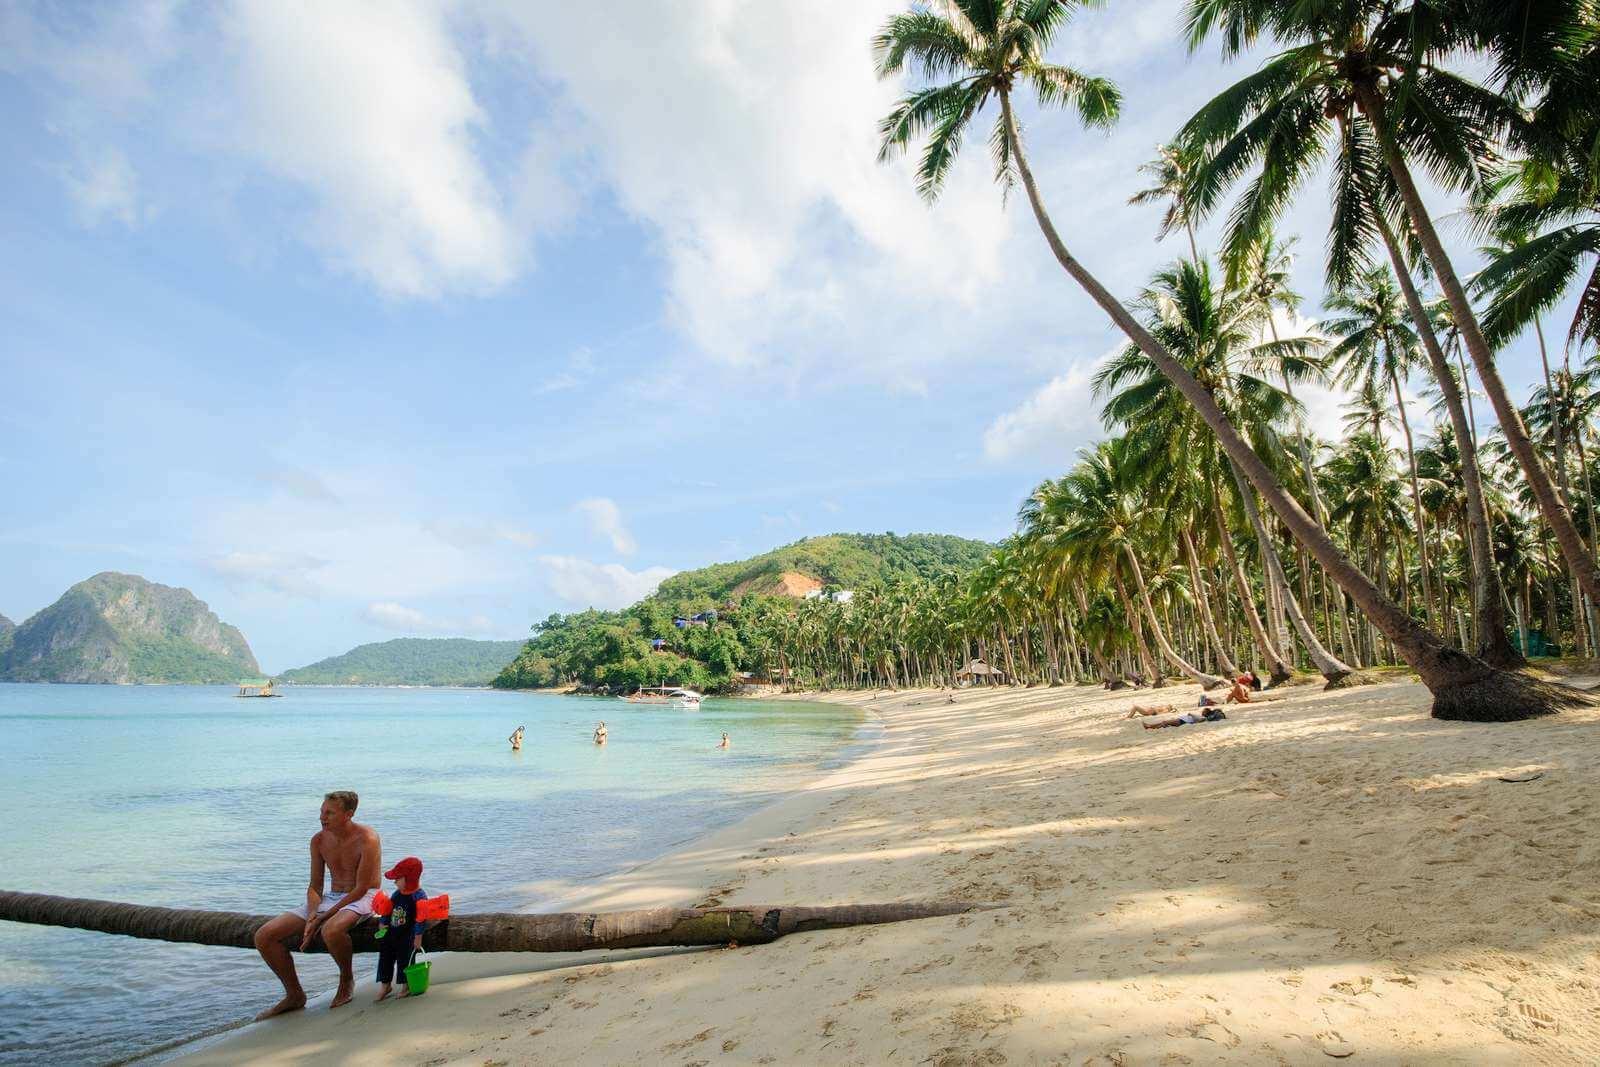 El Nido's Marimegmeg Beach, also called Las Cabanas